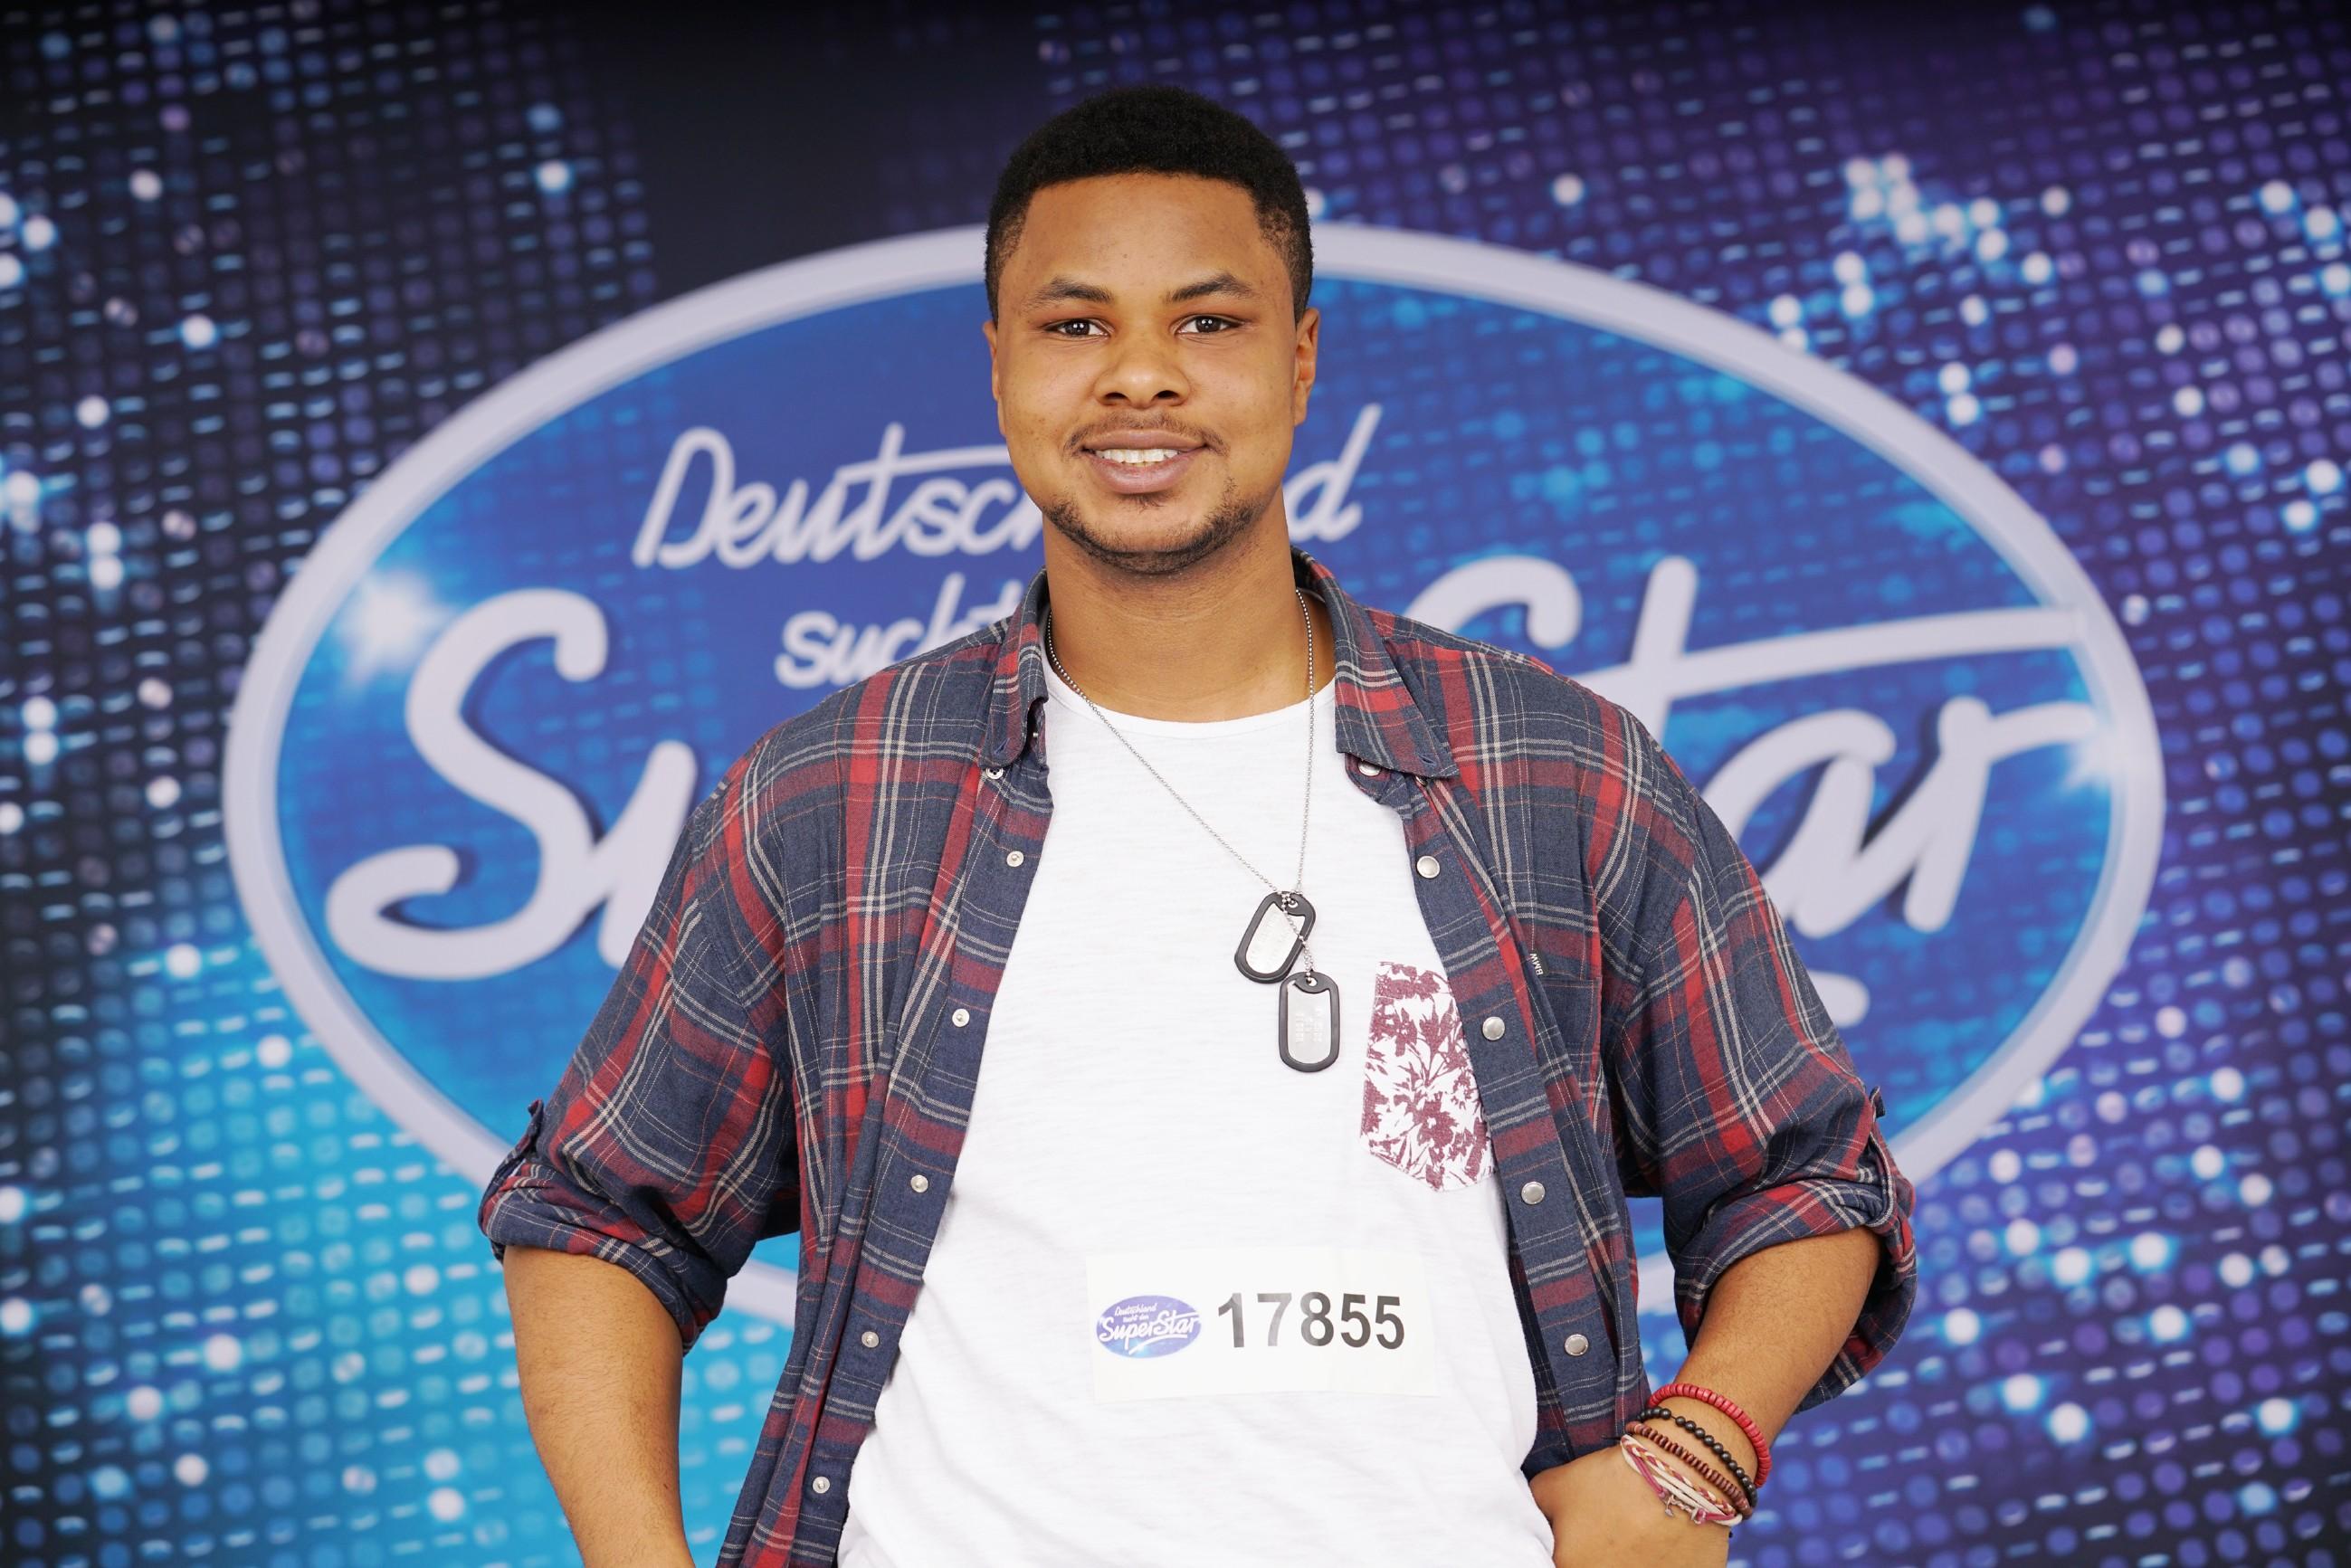 DSDS 2018 TOP 24 - Marc Imam